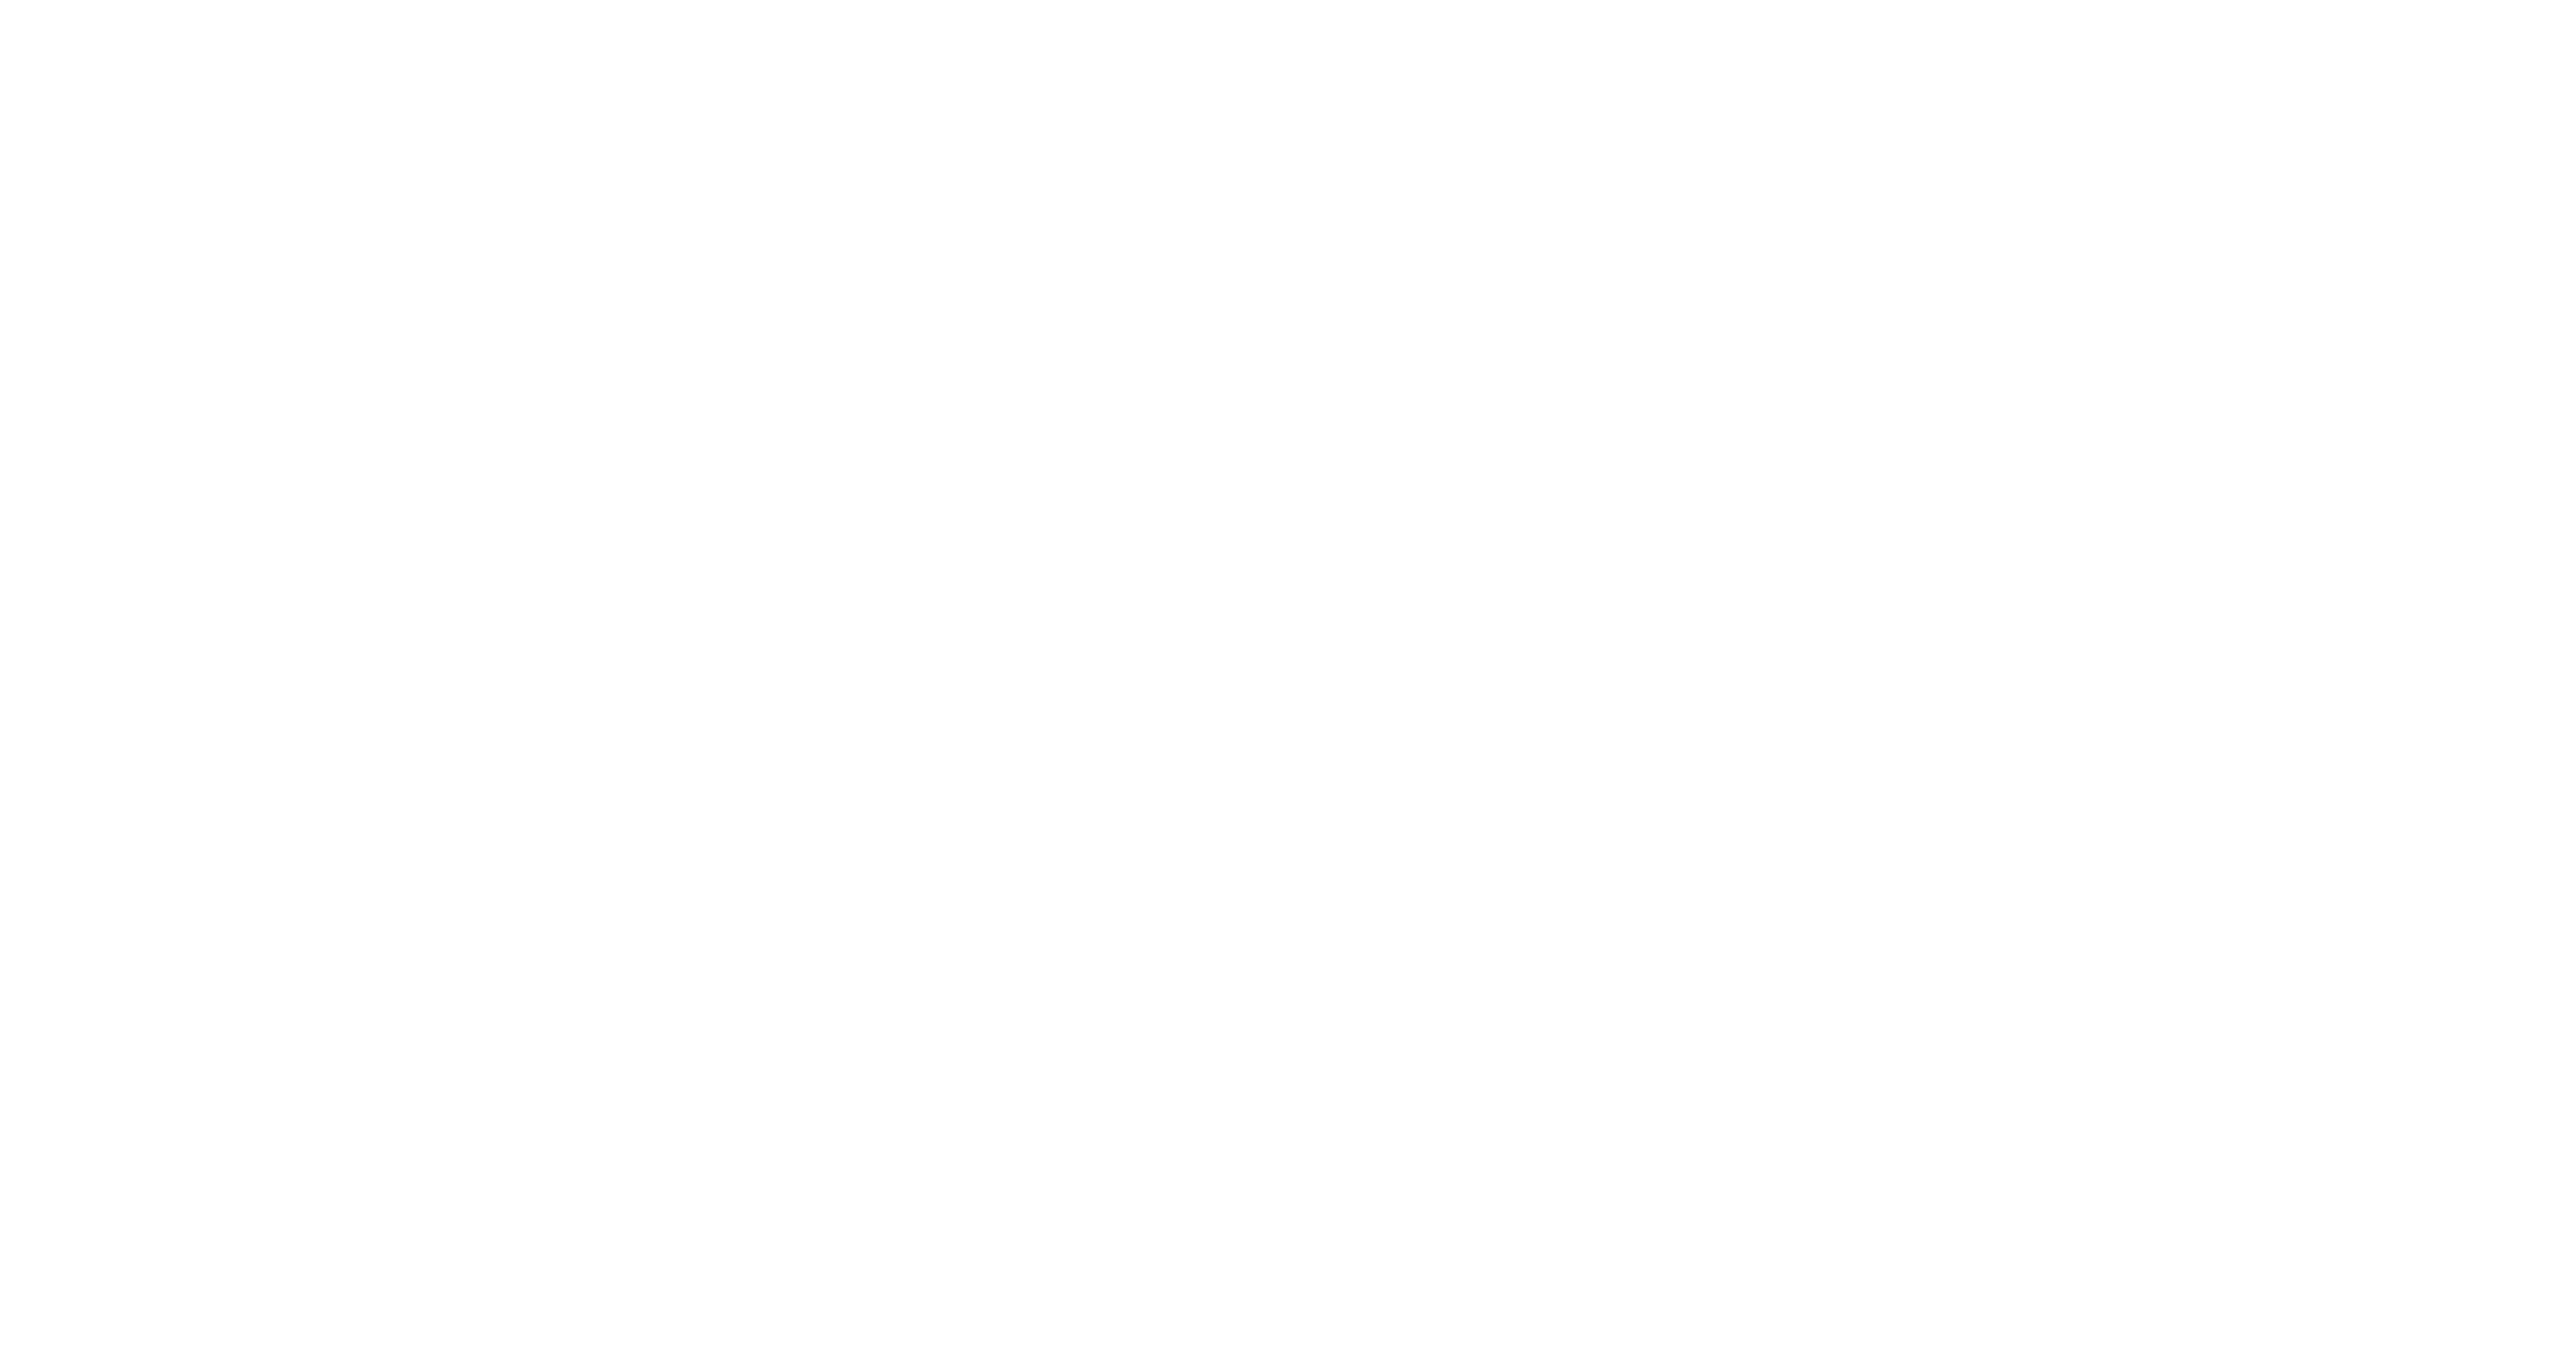 IneoDesignlab_NAC_15-05